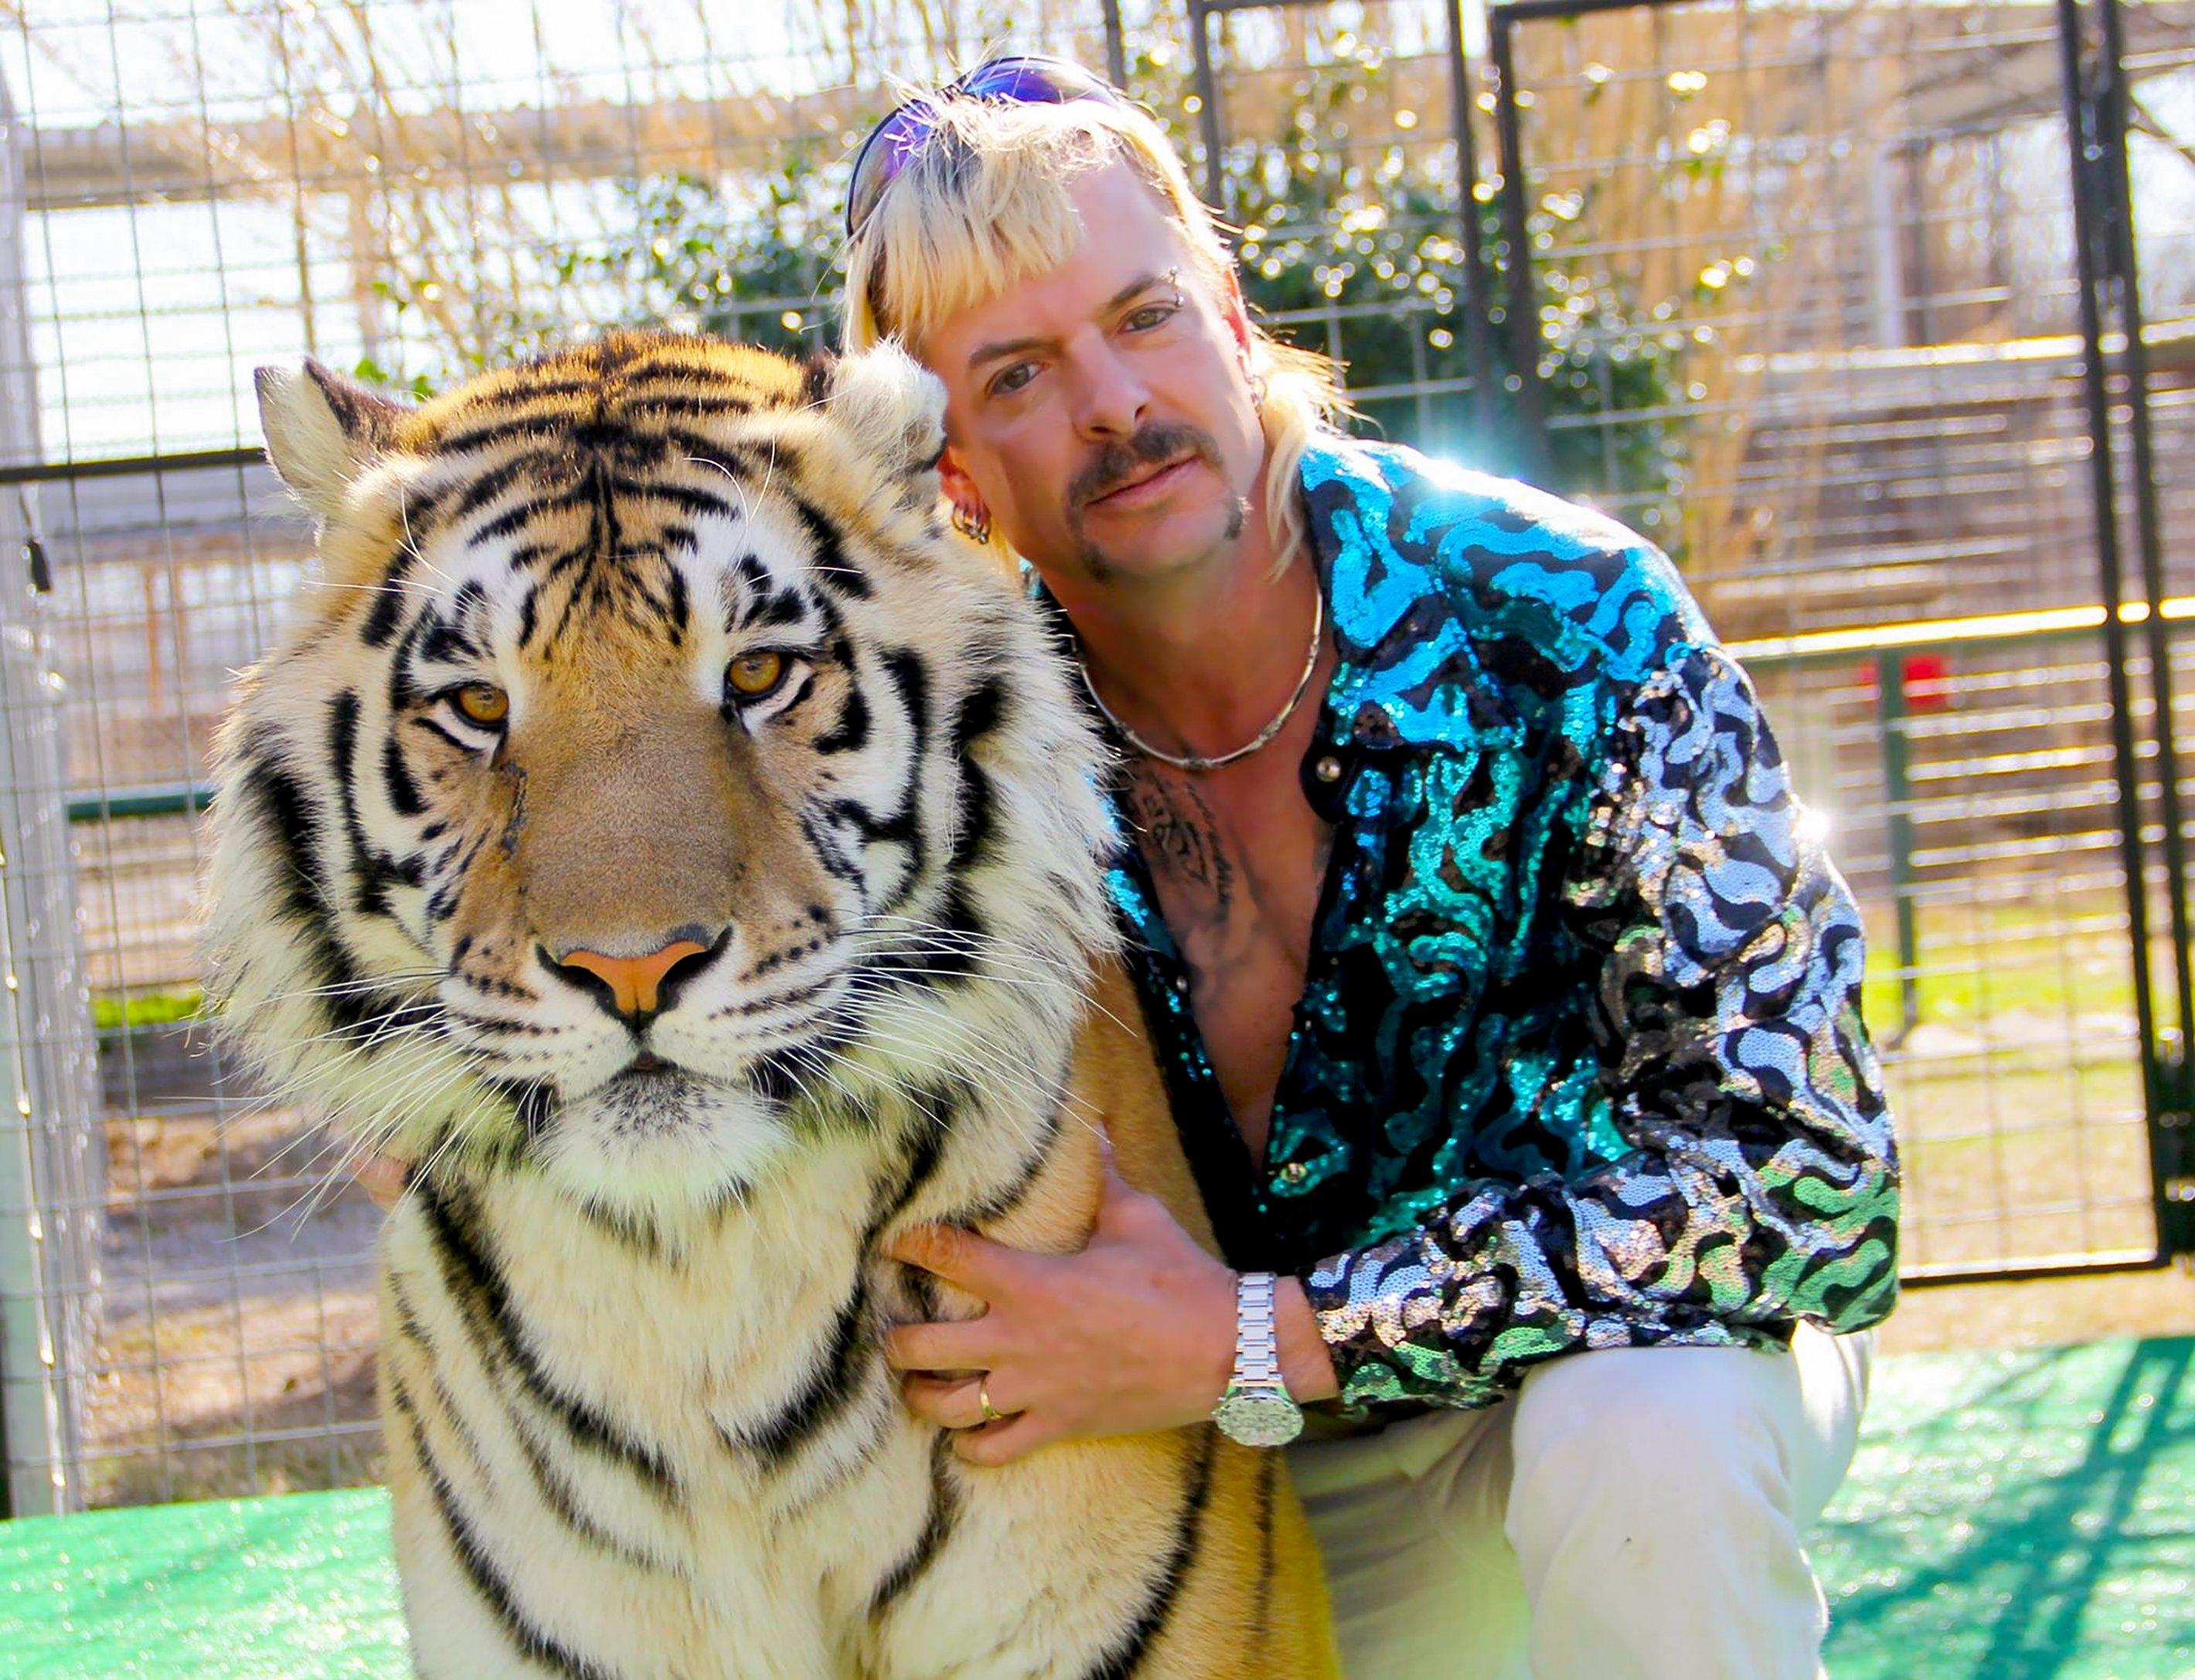 Invoking 'Tiger King,' House passes bill banning big cat ownership